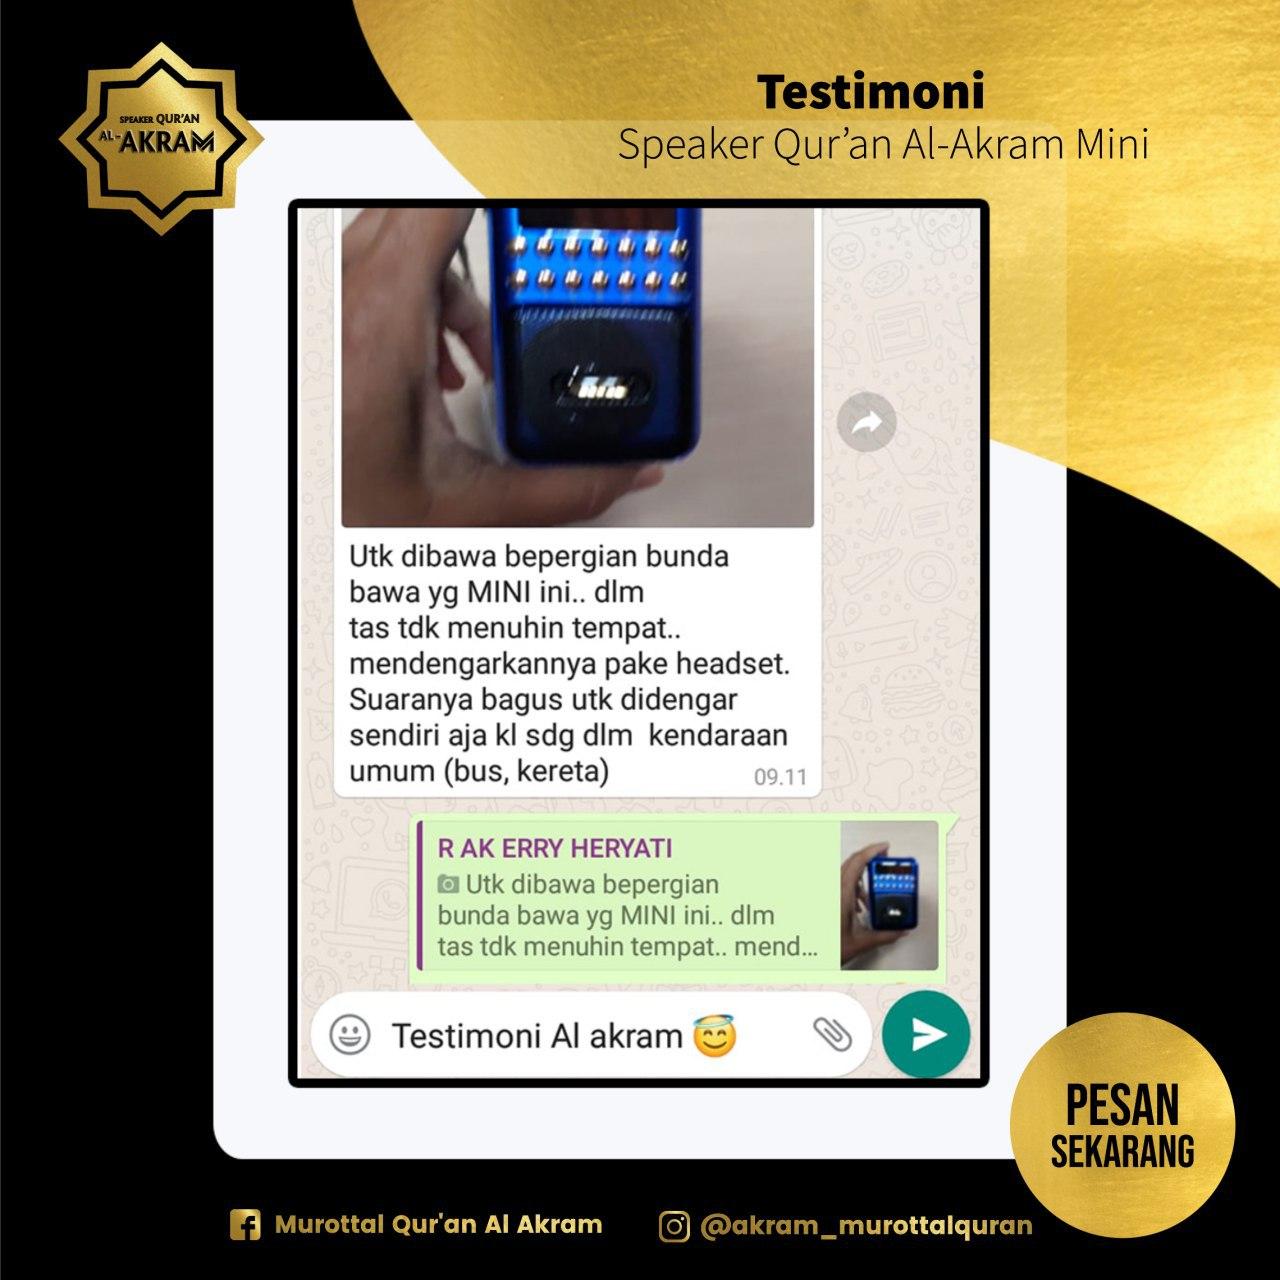 speaker-quran-alakram-testi4